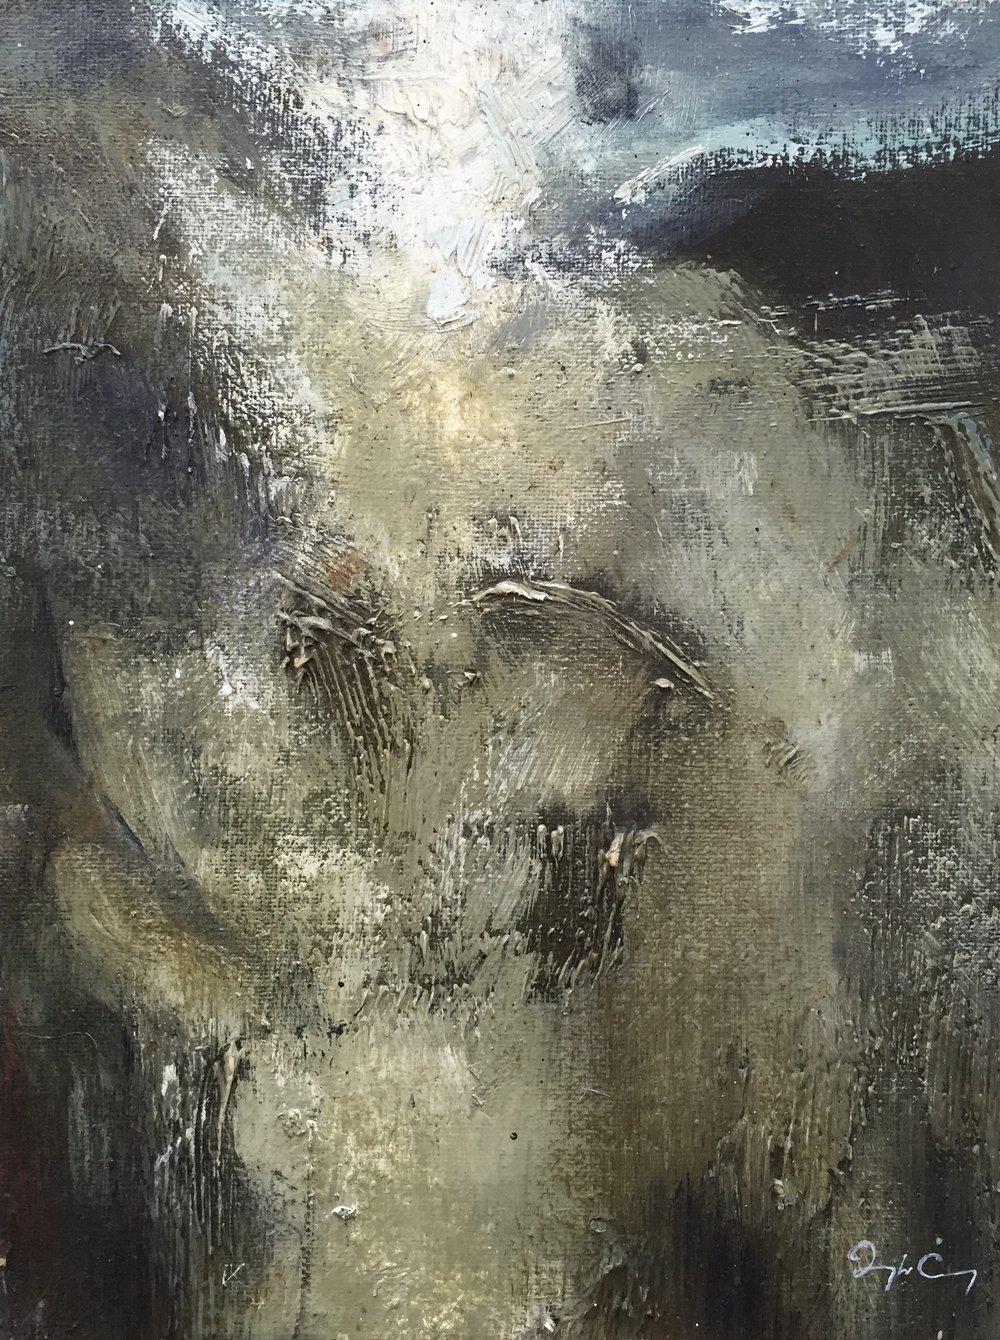 Sun Splitting The Summit, Skellig Michael  Painting 23cm x 30cm. Frame 41cm x 49cm. Oil on canvas on board. Sister Painting to 'Approaching Skellig Michael'. €sold